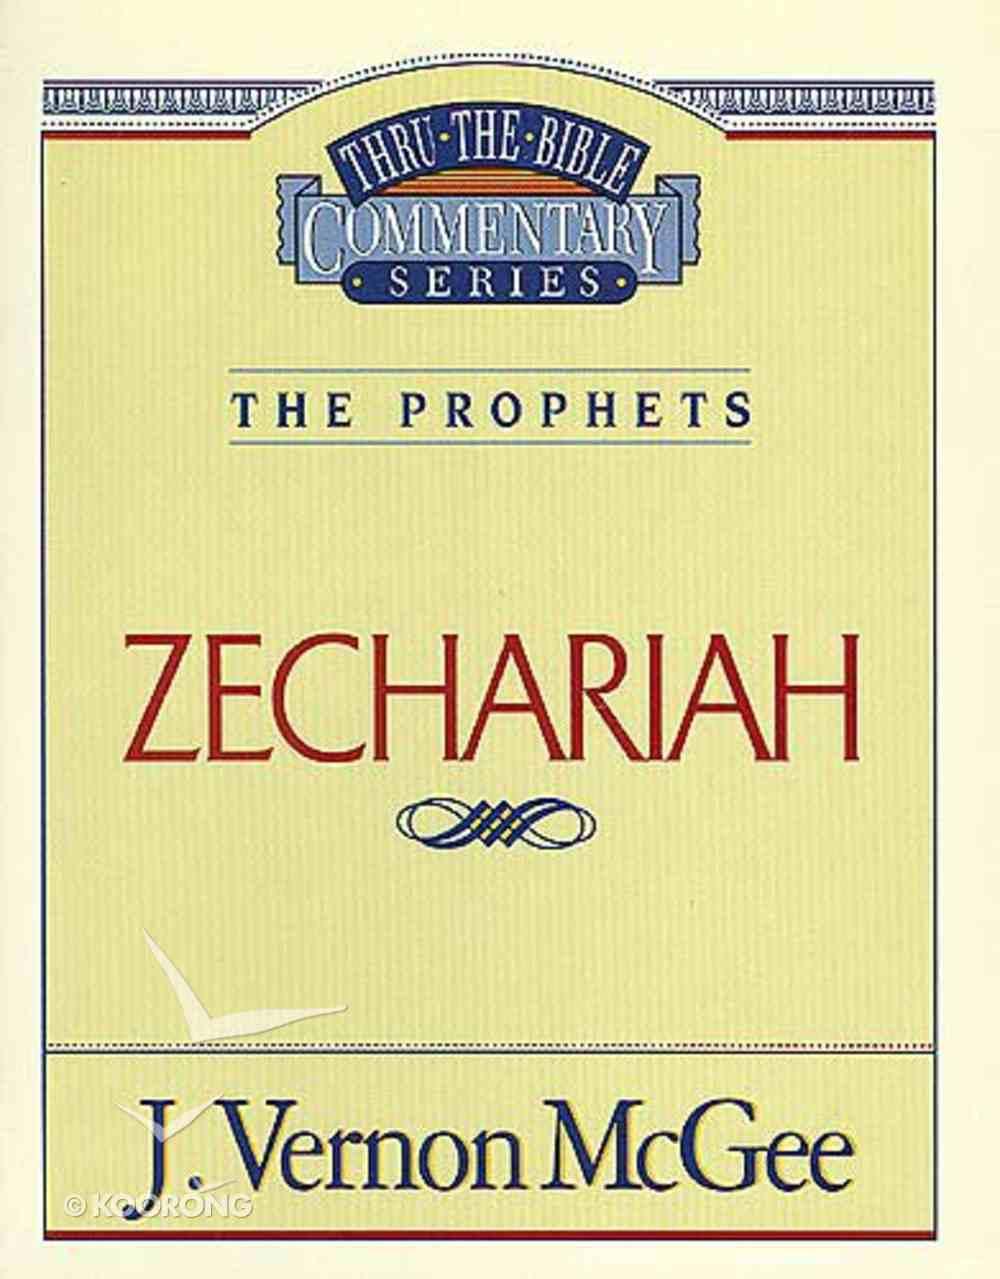 Thru the Bible OT #32: Zechariah (#32 in Thru The Bible Old Testament Series) Paperback